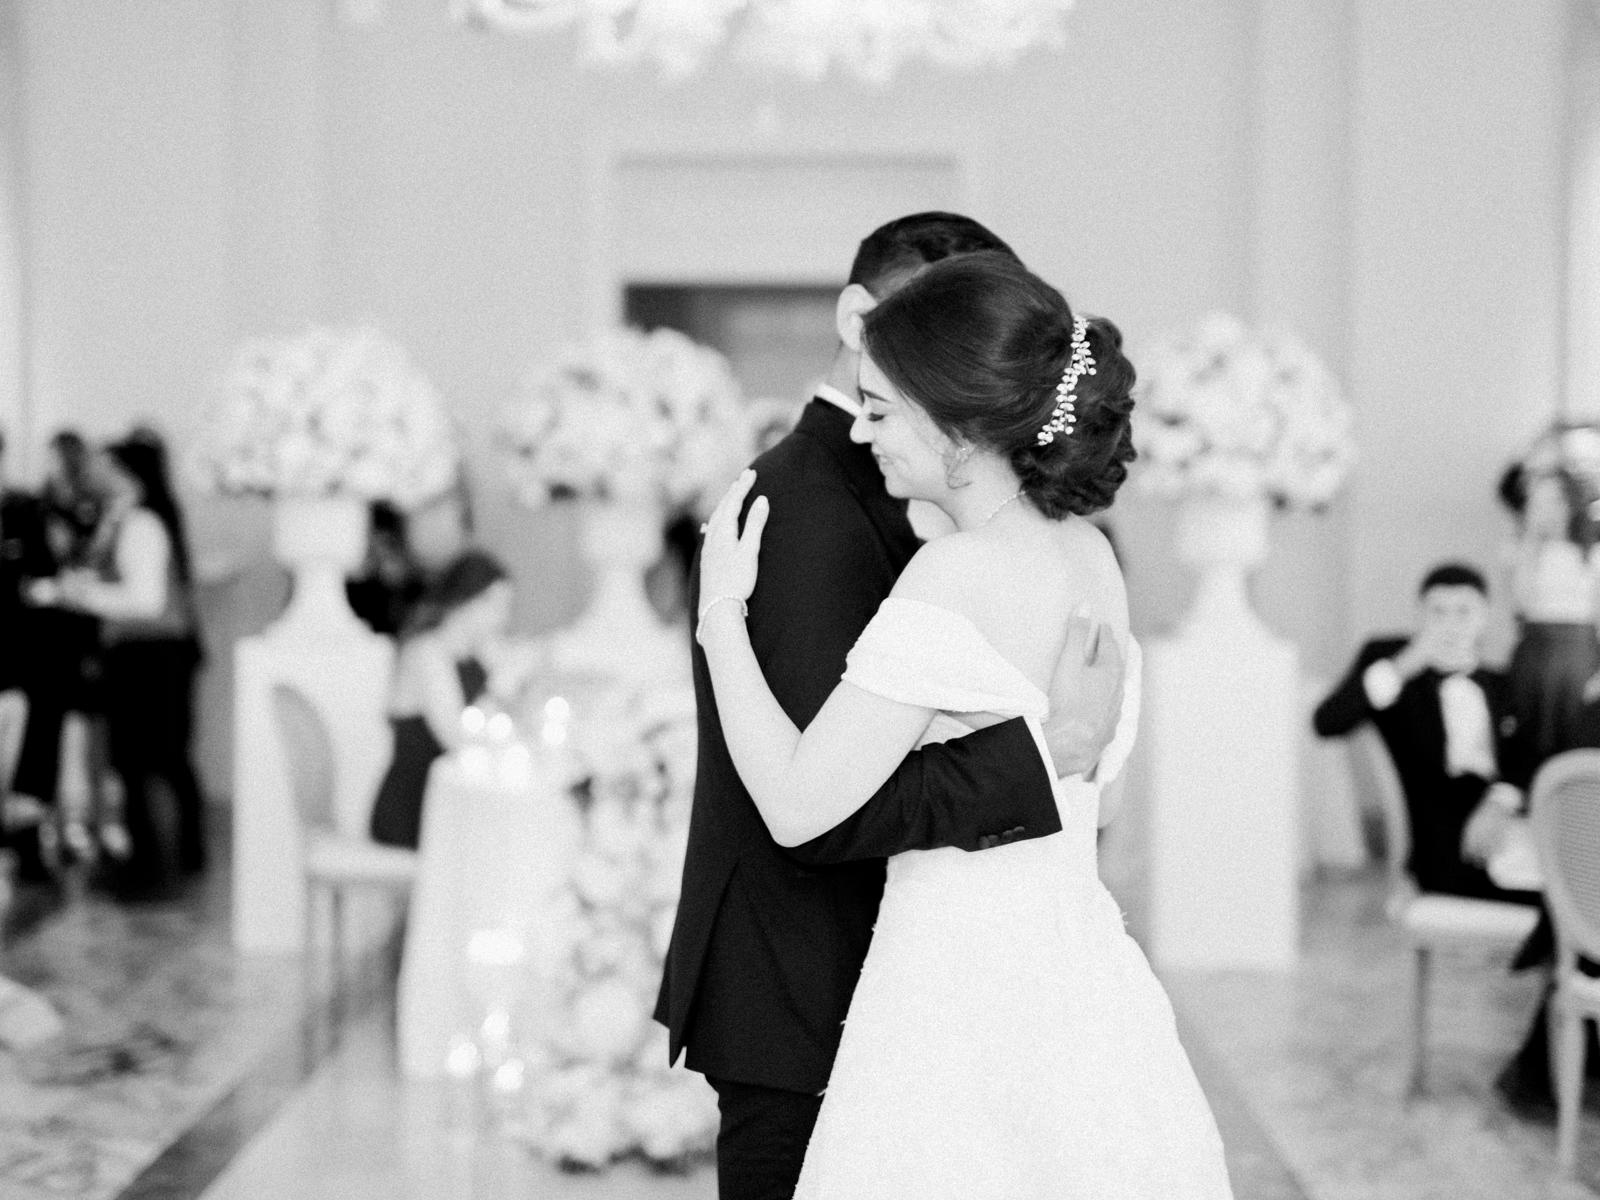 Palace_Villa_Cortine_Hotel_Italian_Wedding_Photographer_Sirmione_AKP-43.jpg